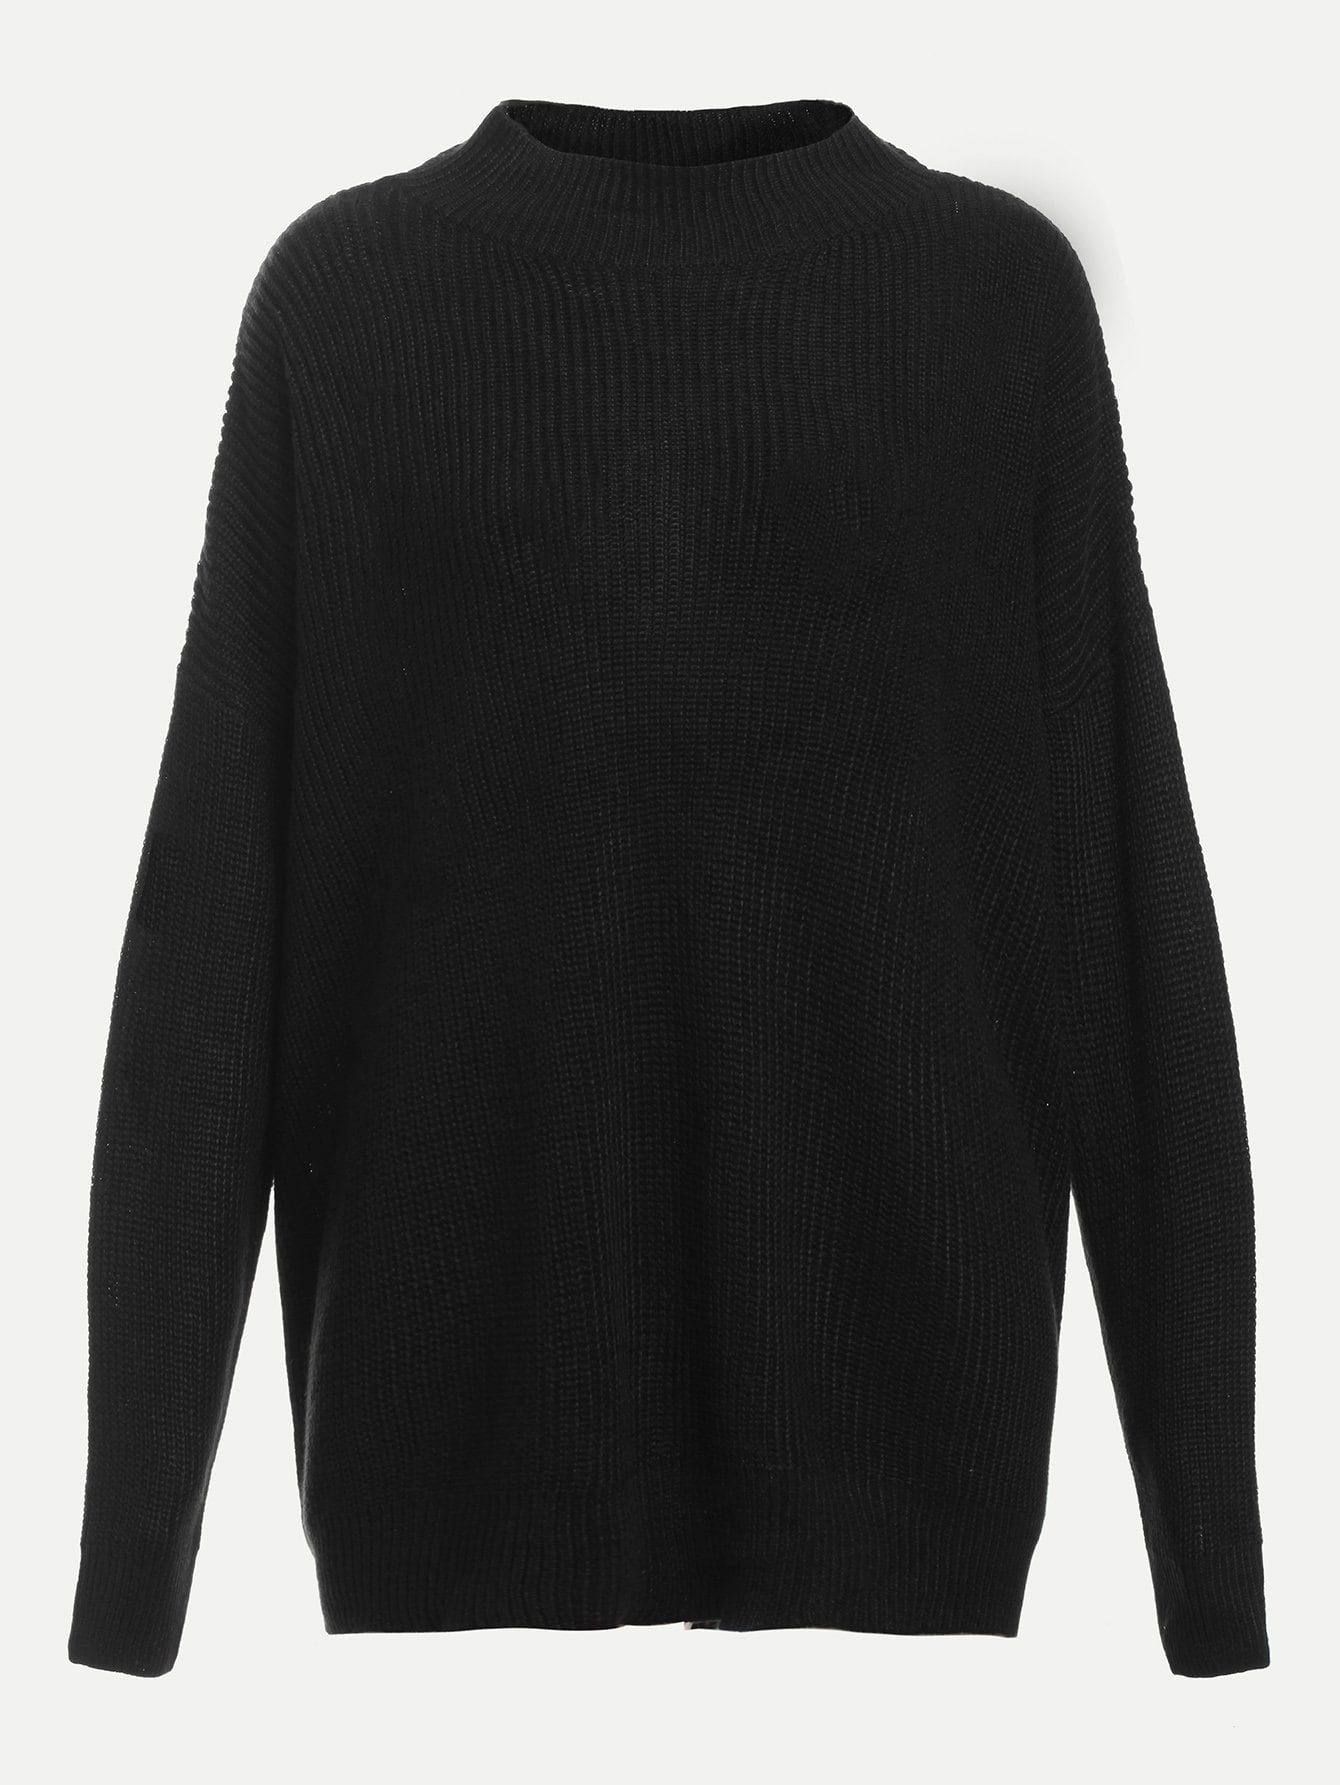 V Cut Out Back Dropped Shoulder Sweater